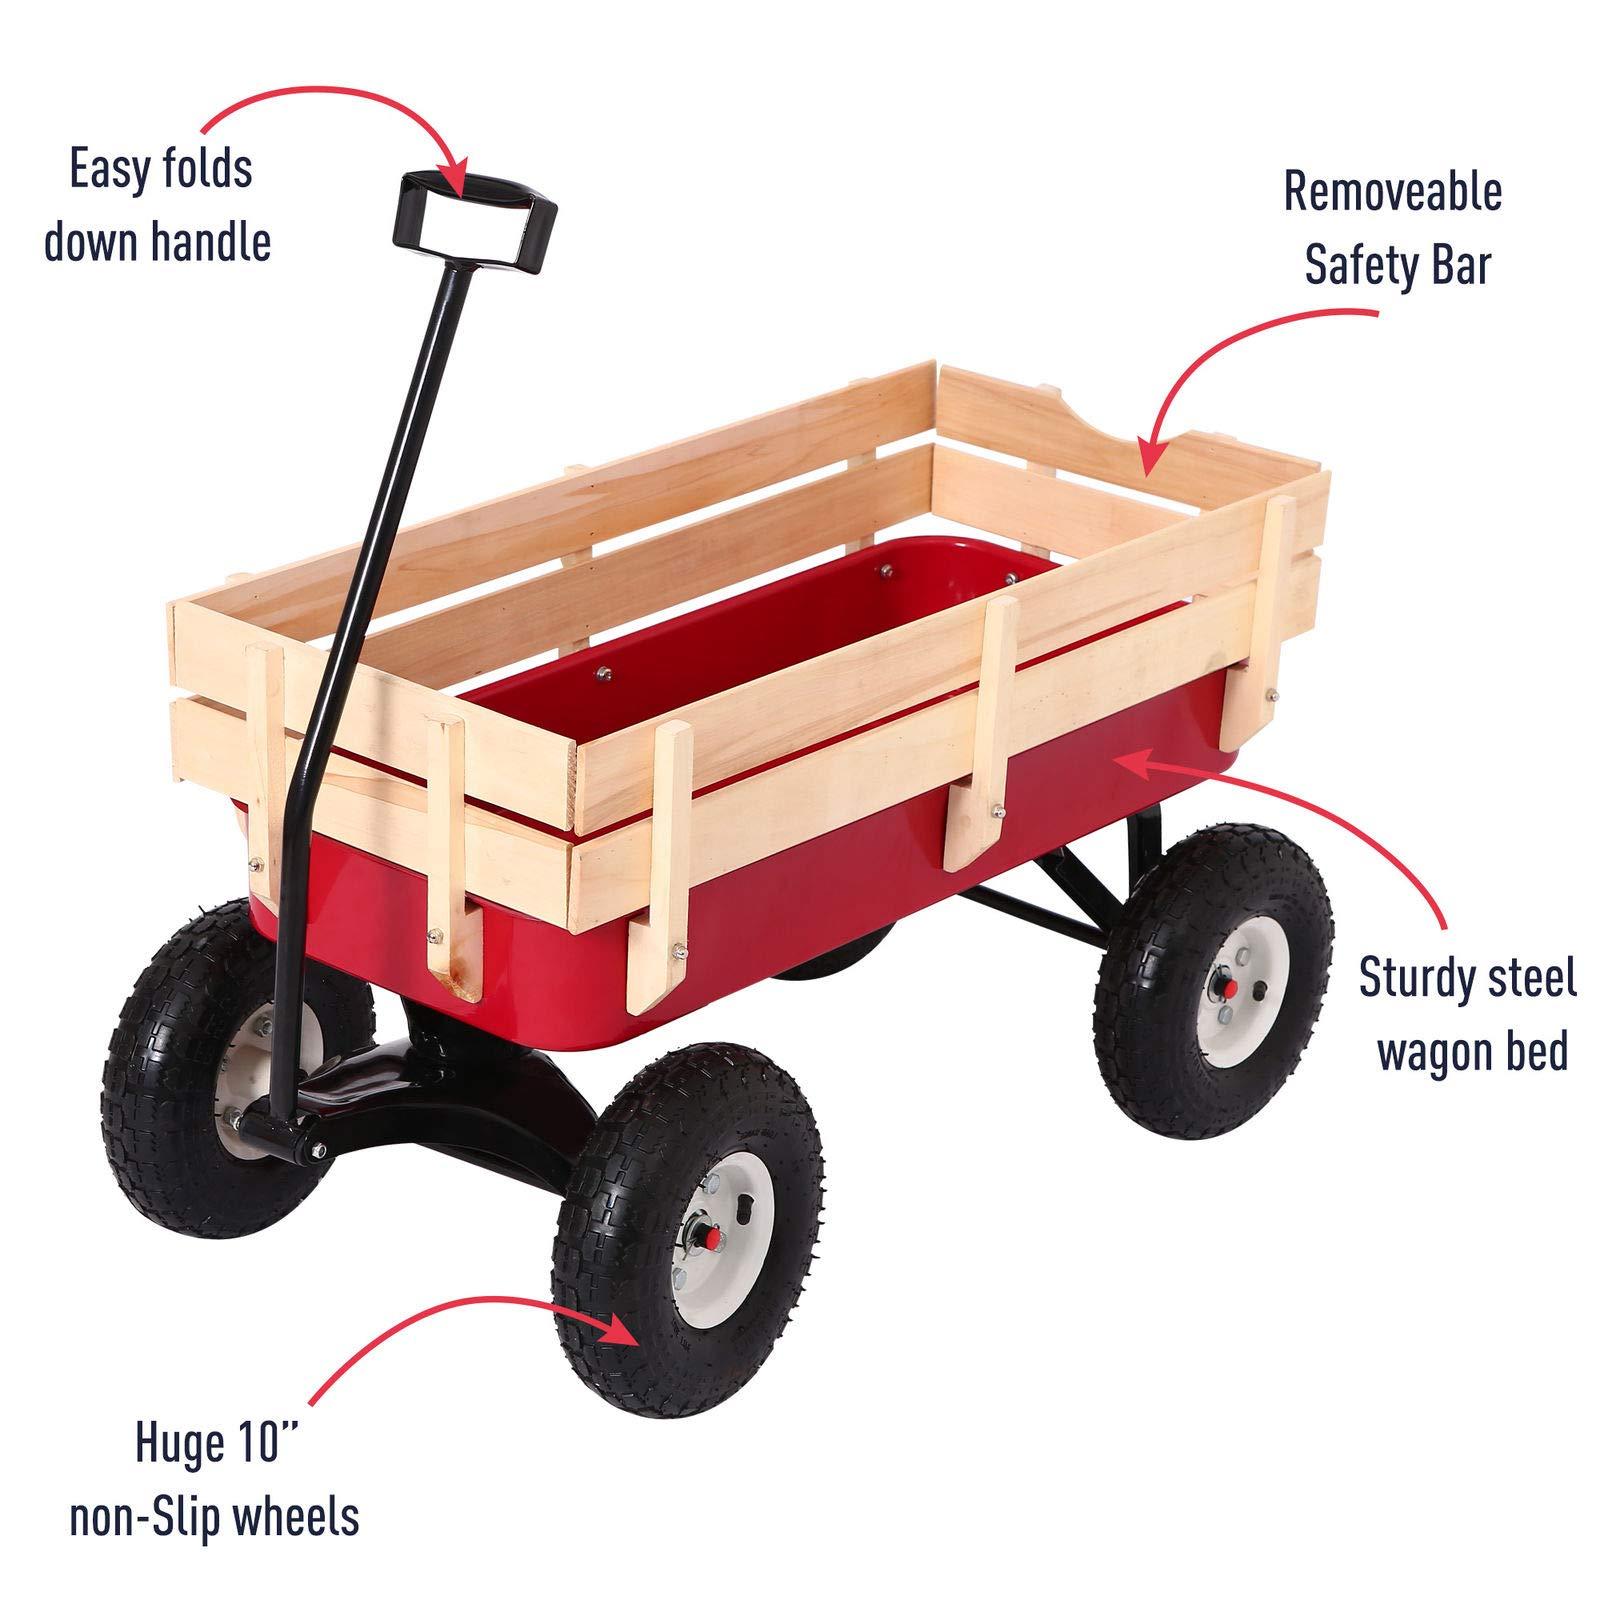 Bonebit Outdoor All Terrain Wagon Yard Beach Cargo Cart w/Wood Sides